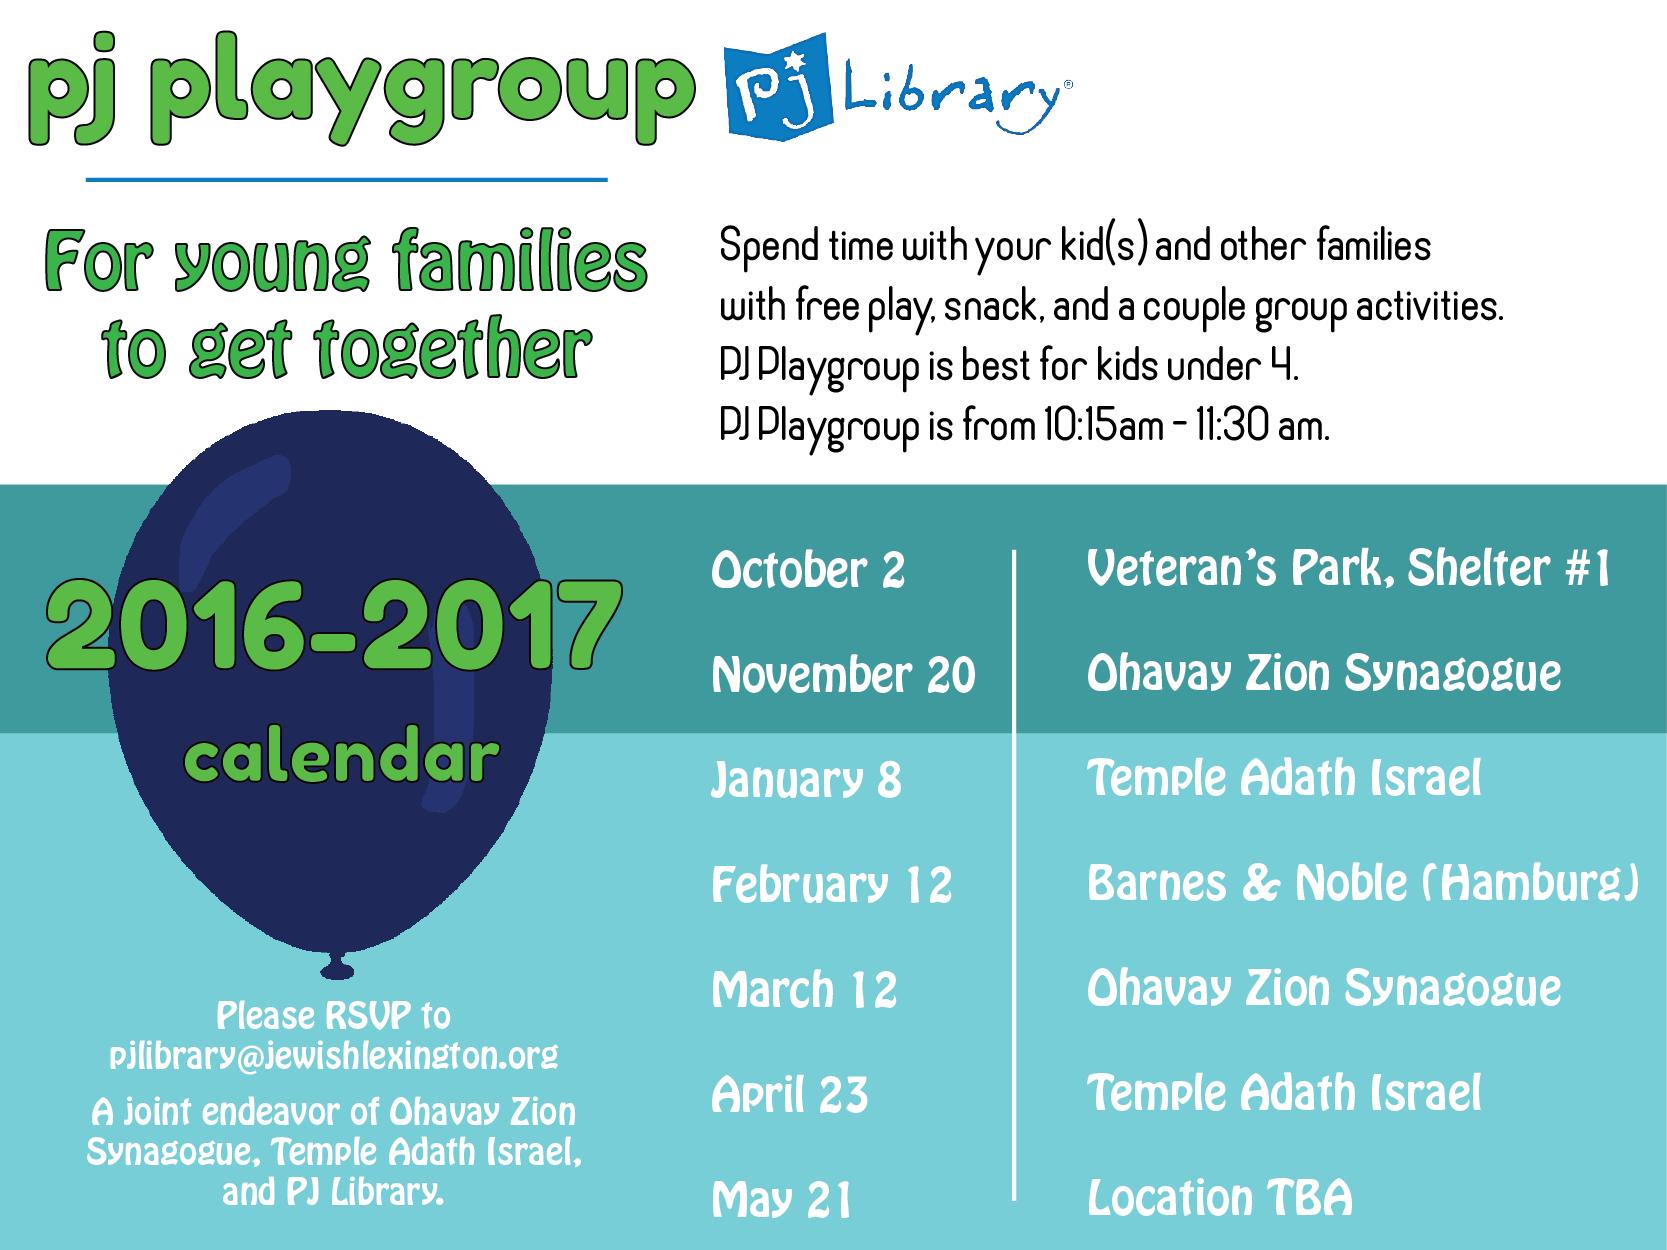 2016 PJ Playgroup Calendar.png